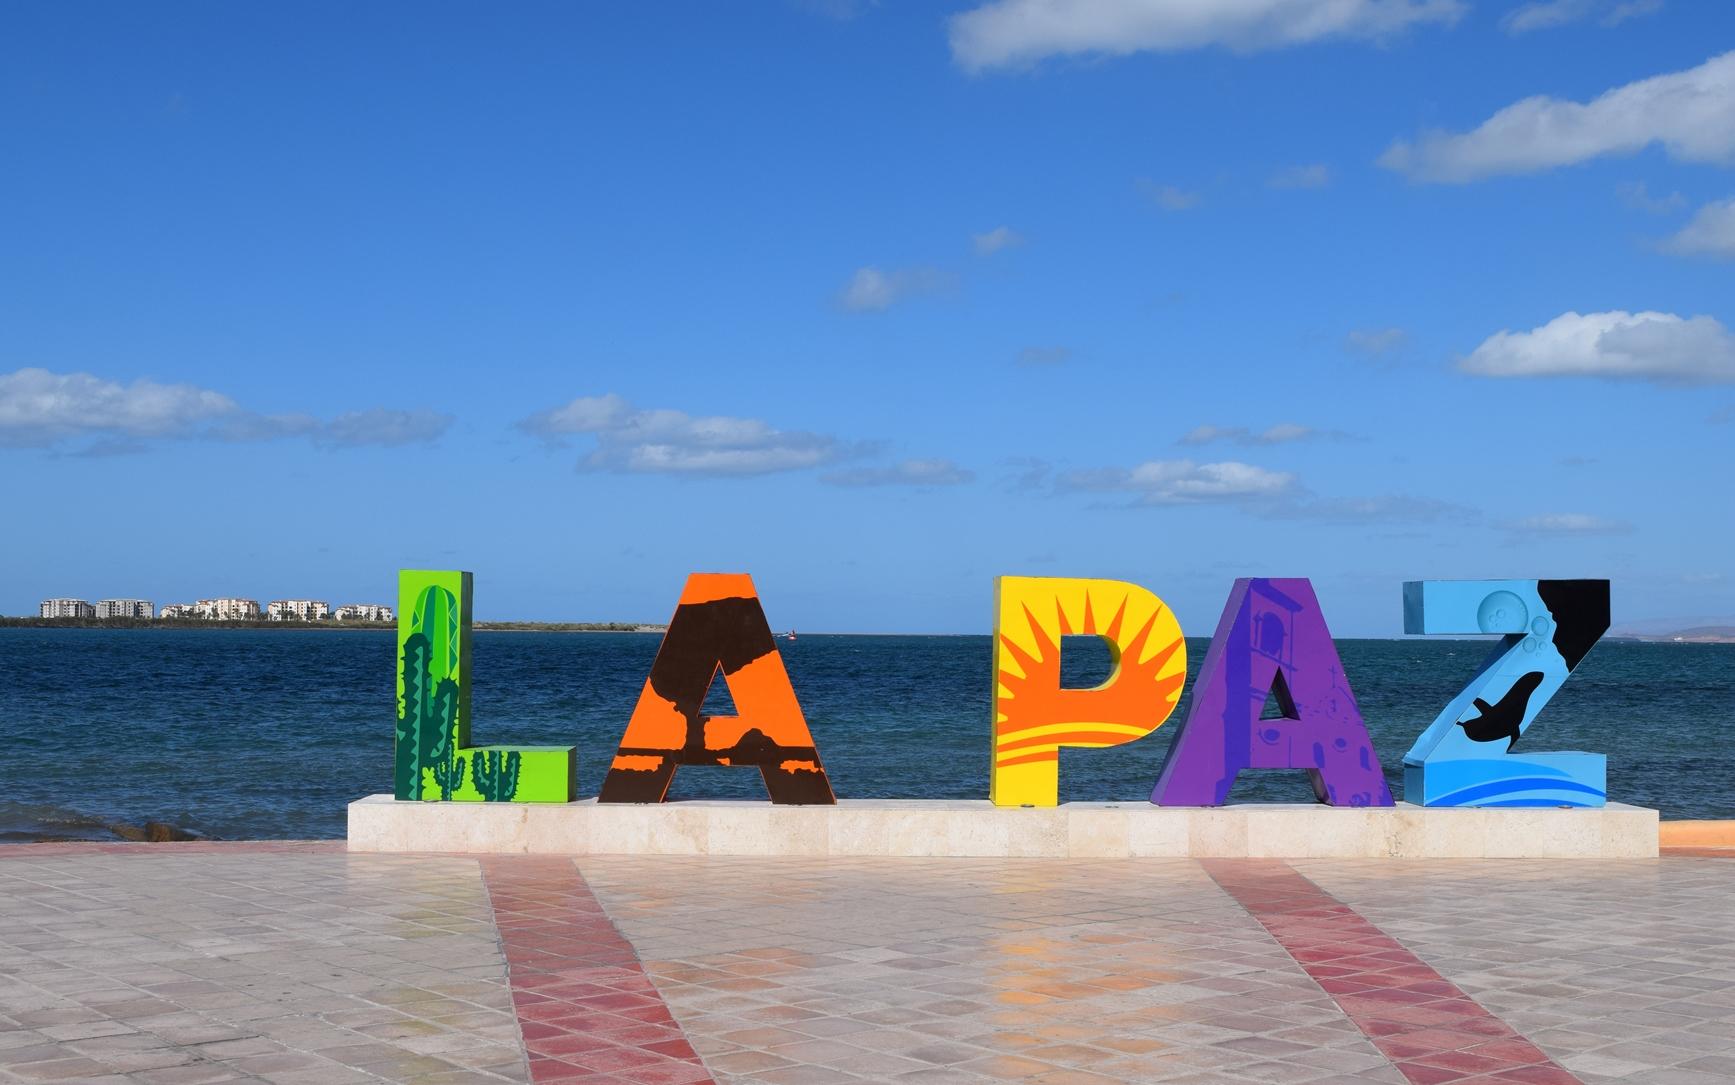 Caravana migrante toma nuevo rumbo a La Paz